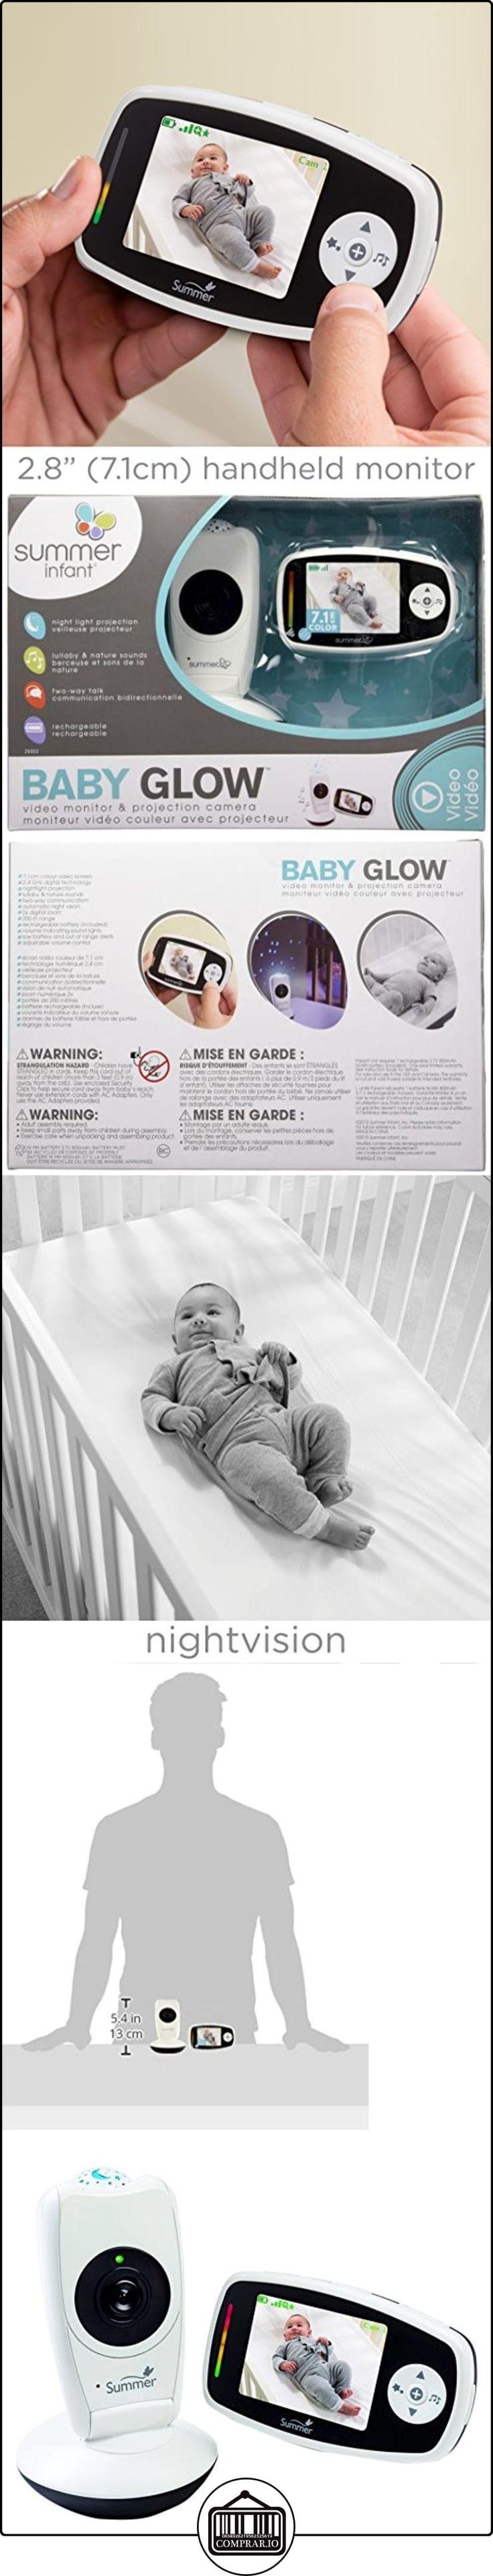 Vigilabebes camara Summer Infant Baby Glow video monitor  ✿ Vigilabebés - Seguridad ✿ ▬► Ver oferta: http://comprar.io/goto/B01B7BVPLI